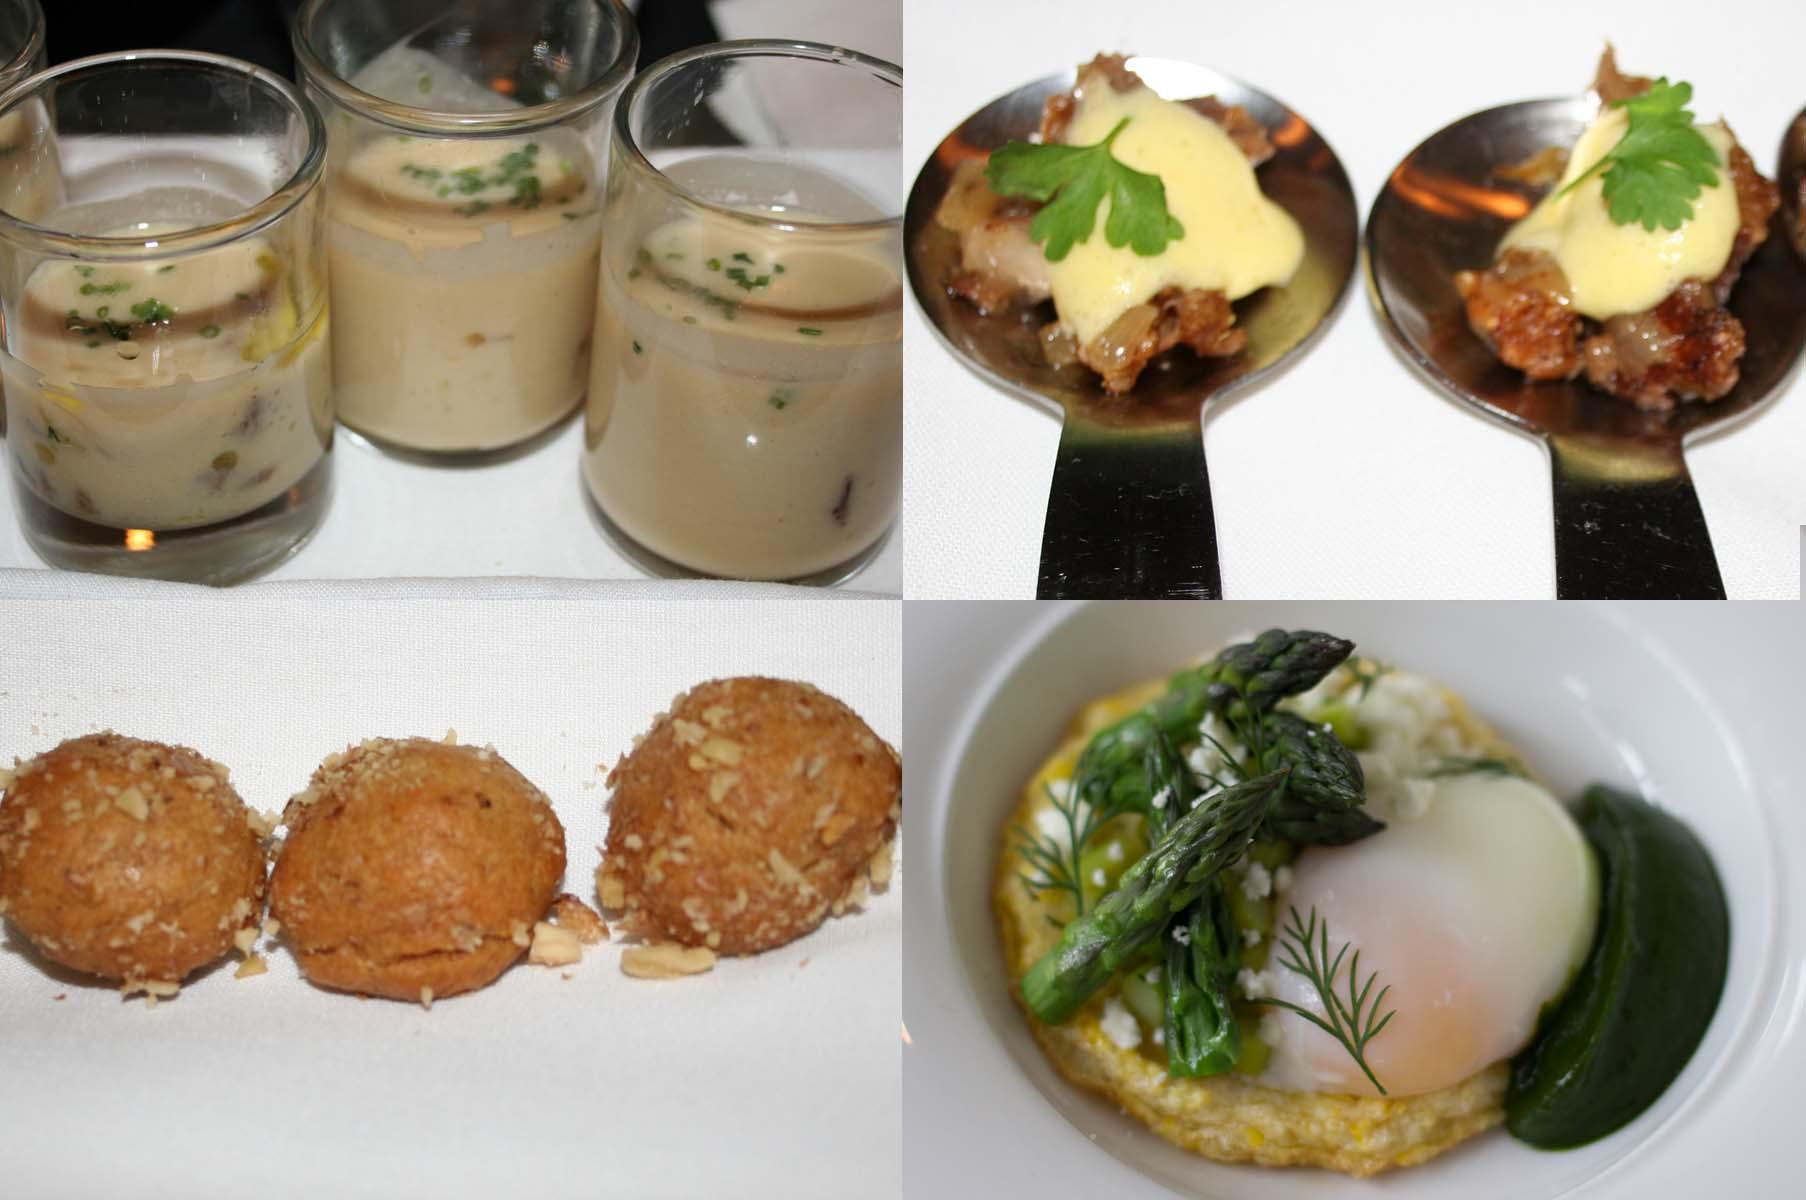 Also on the menu are mayiritsa, lobster avgolemono, an asparagus omelet and loukamades. (Photos: Mark Heckathorn/DC on Heels)